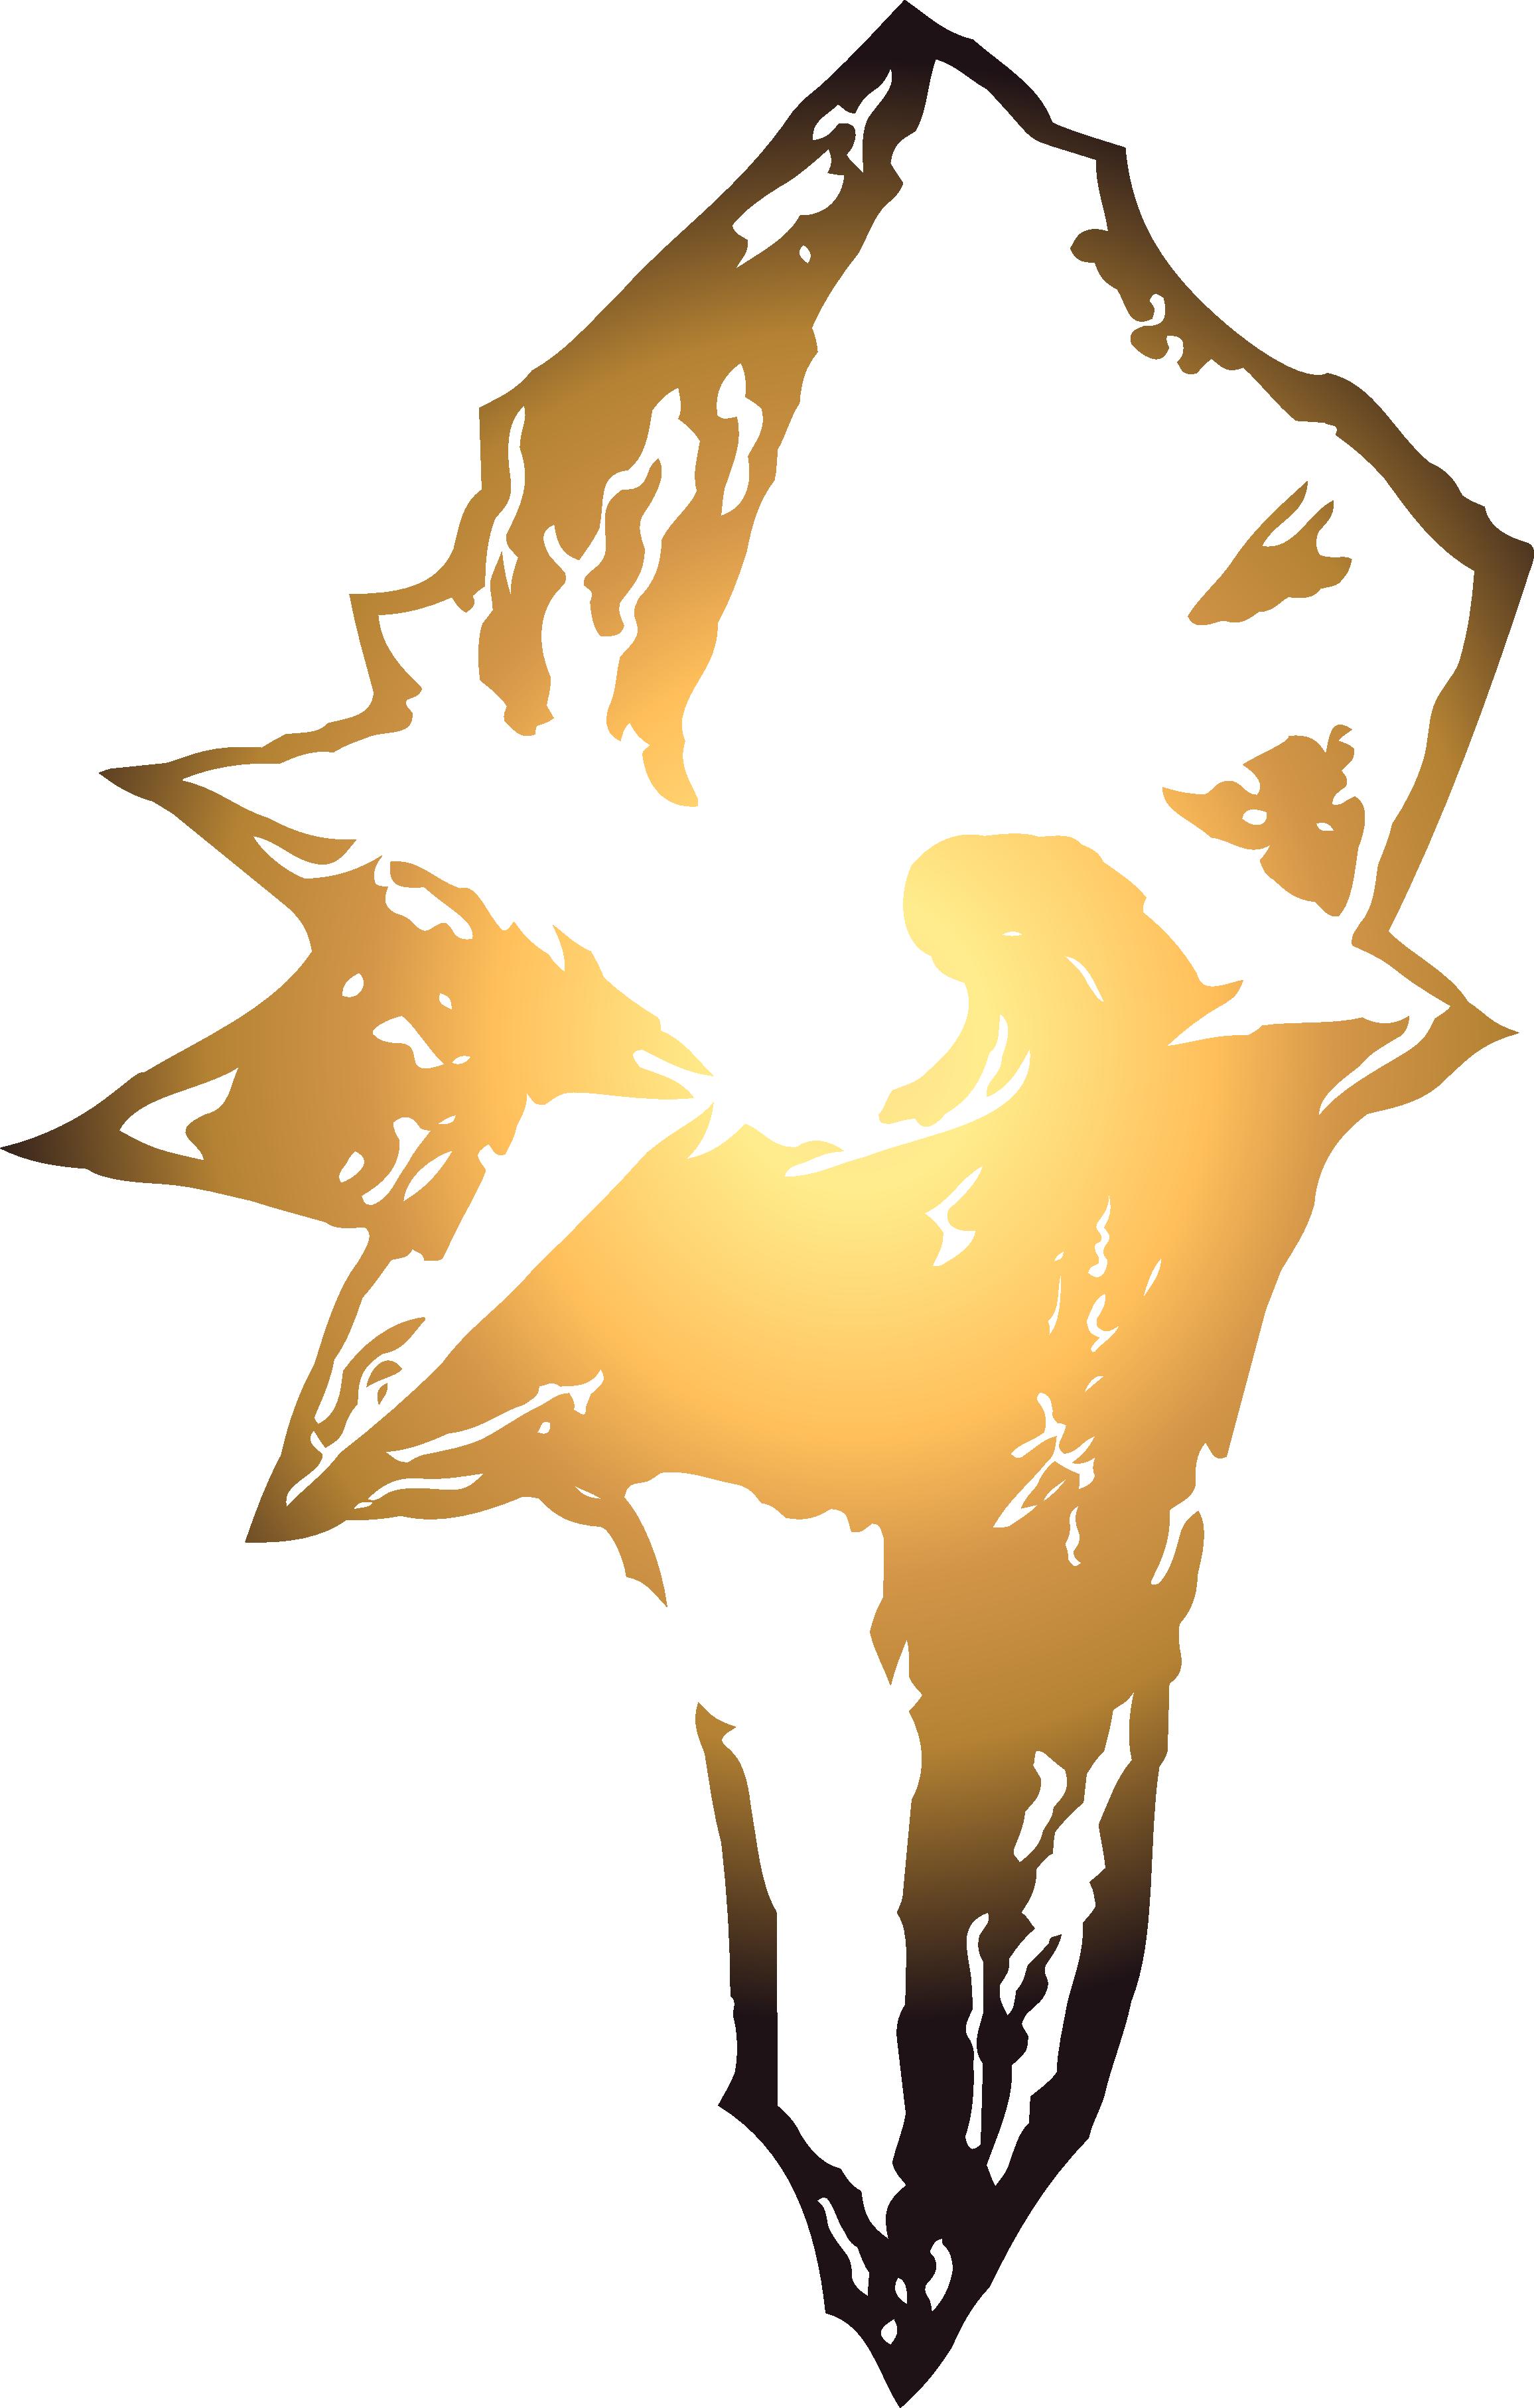 Final fantasy logo art - photo#33